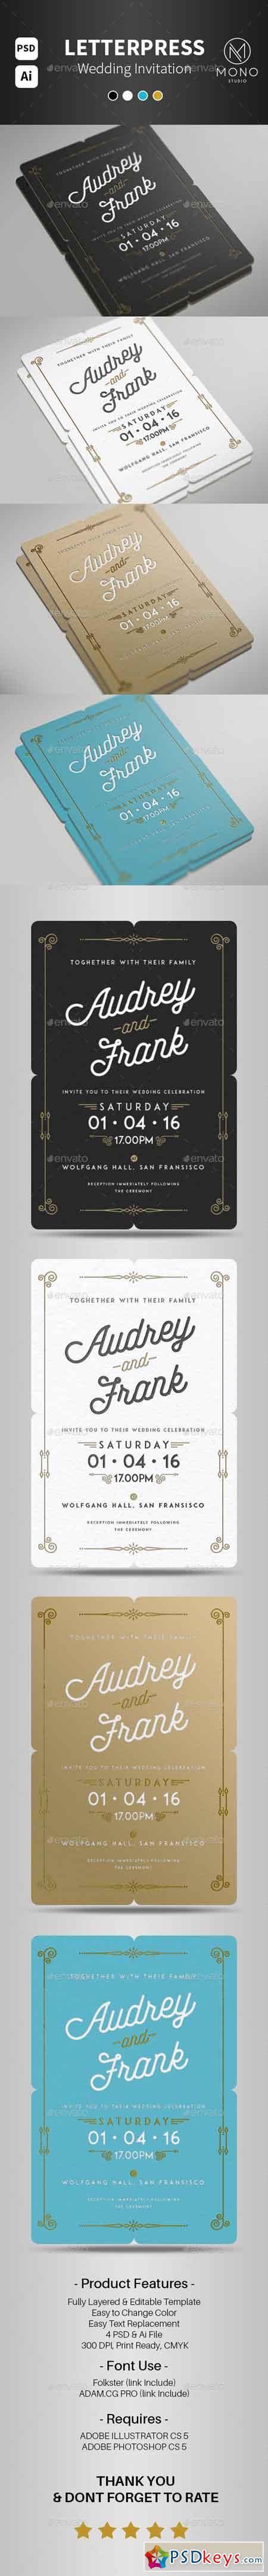 Letterpress Wedding Invitation 14145268